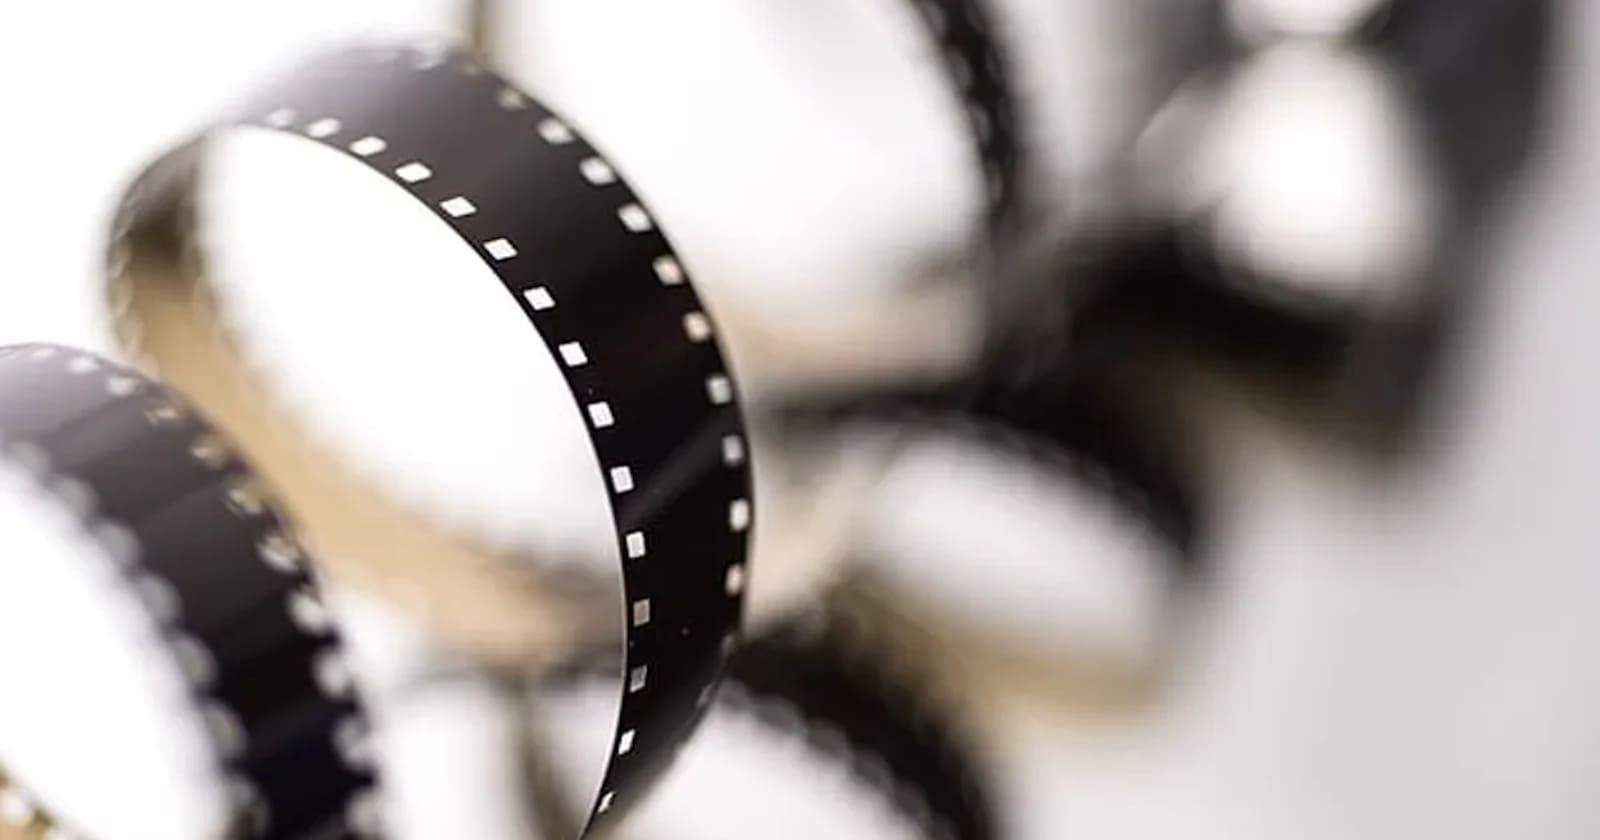 https://ziarul.romania-rationala.ro/control/articole/articole/sprijinirea-industriei-cinematografice-romanesti.jpg